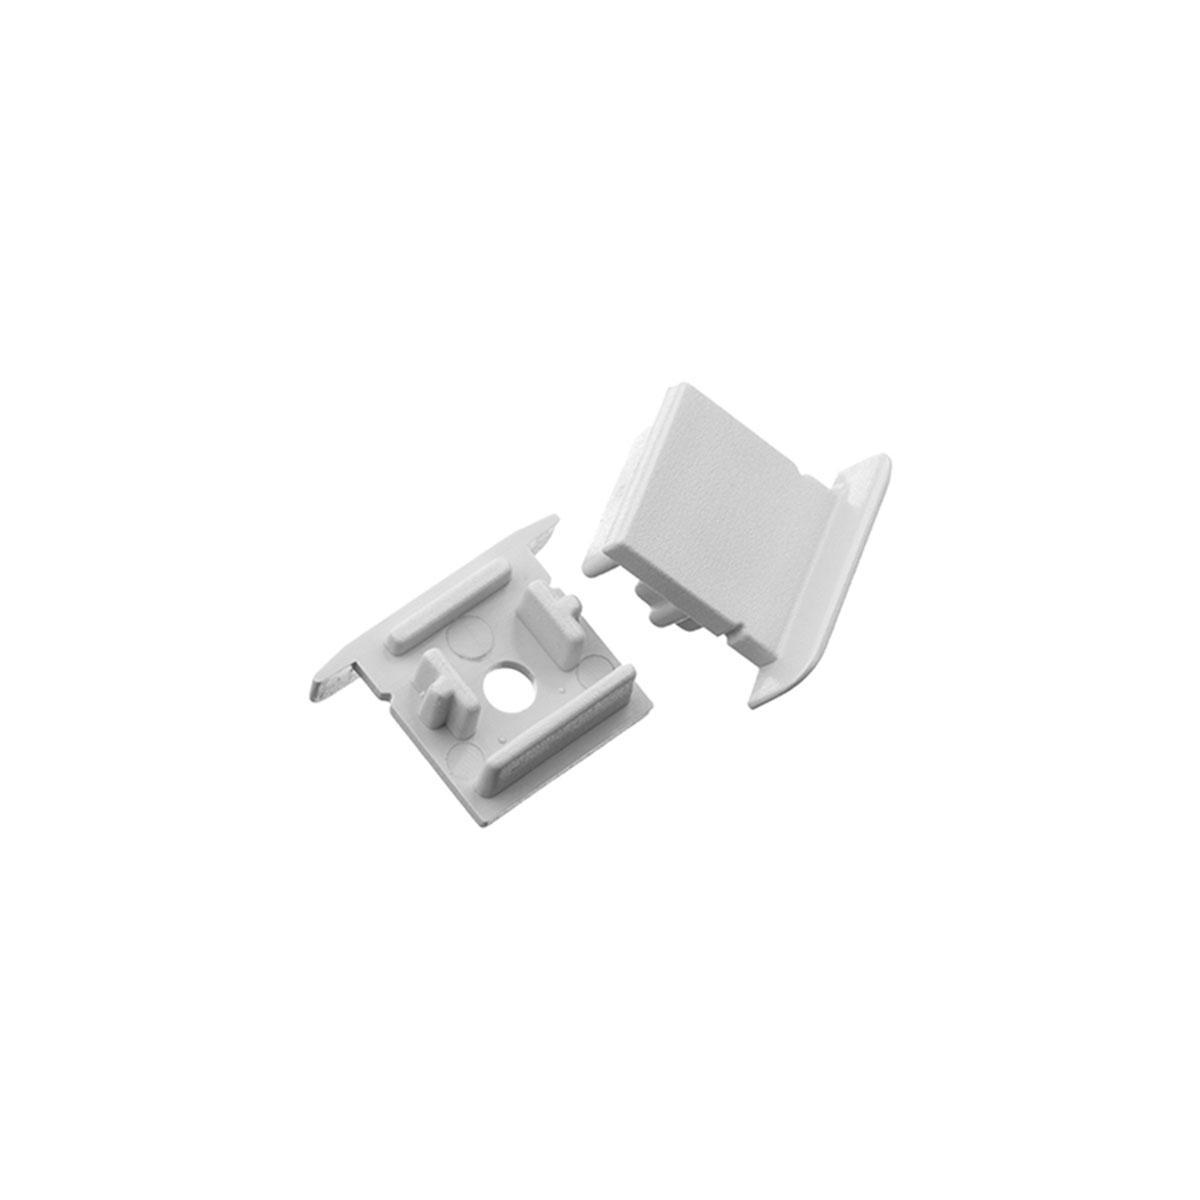 1 Paar Endkappen für Fugen-Profil 20 x 15mm (4303)